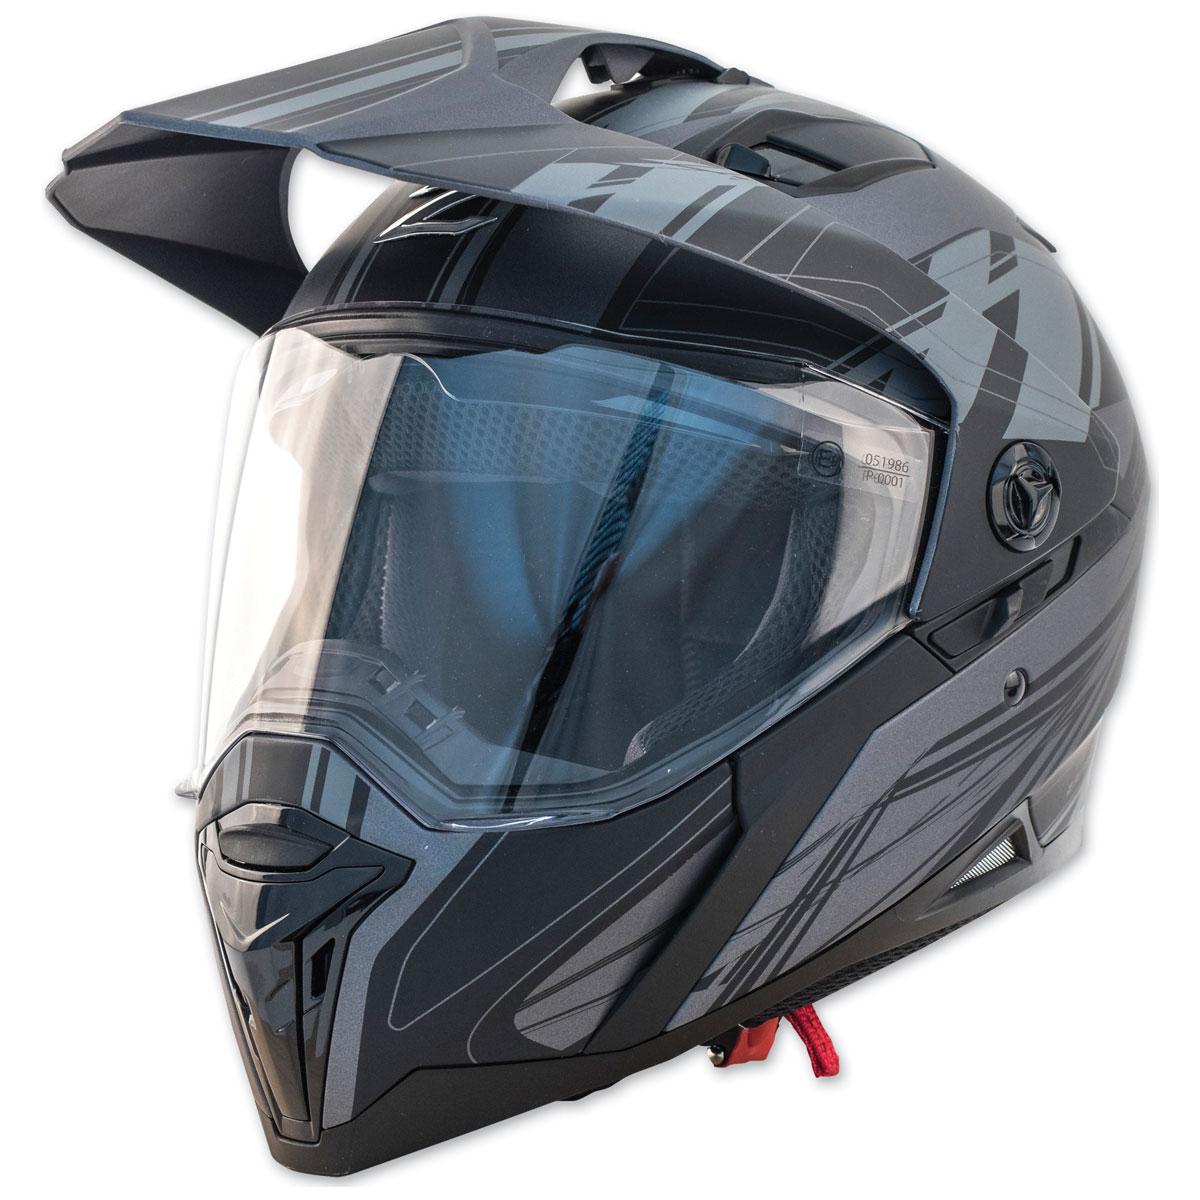 Zox Z-Series Z-DS10 Urbanite Matte Dark Silver Dual Sport Helmet